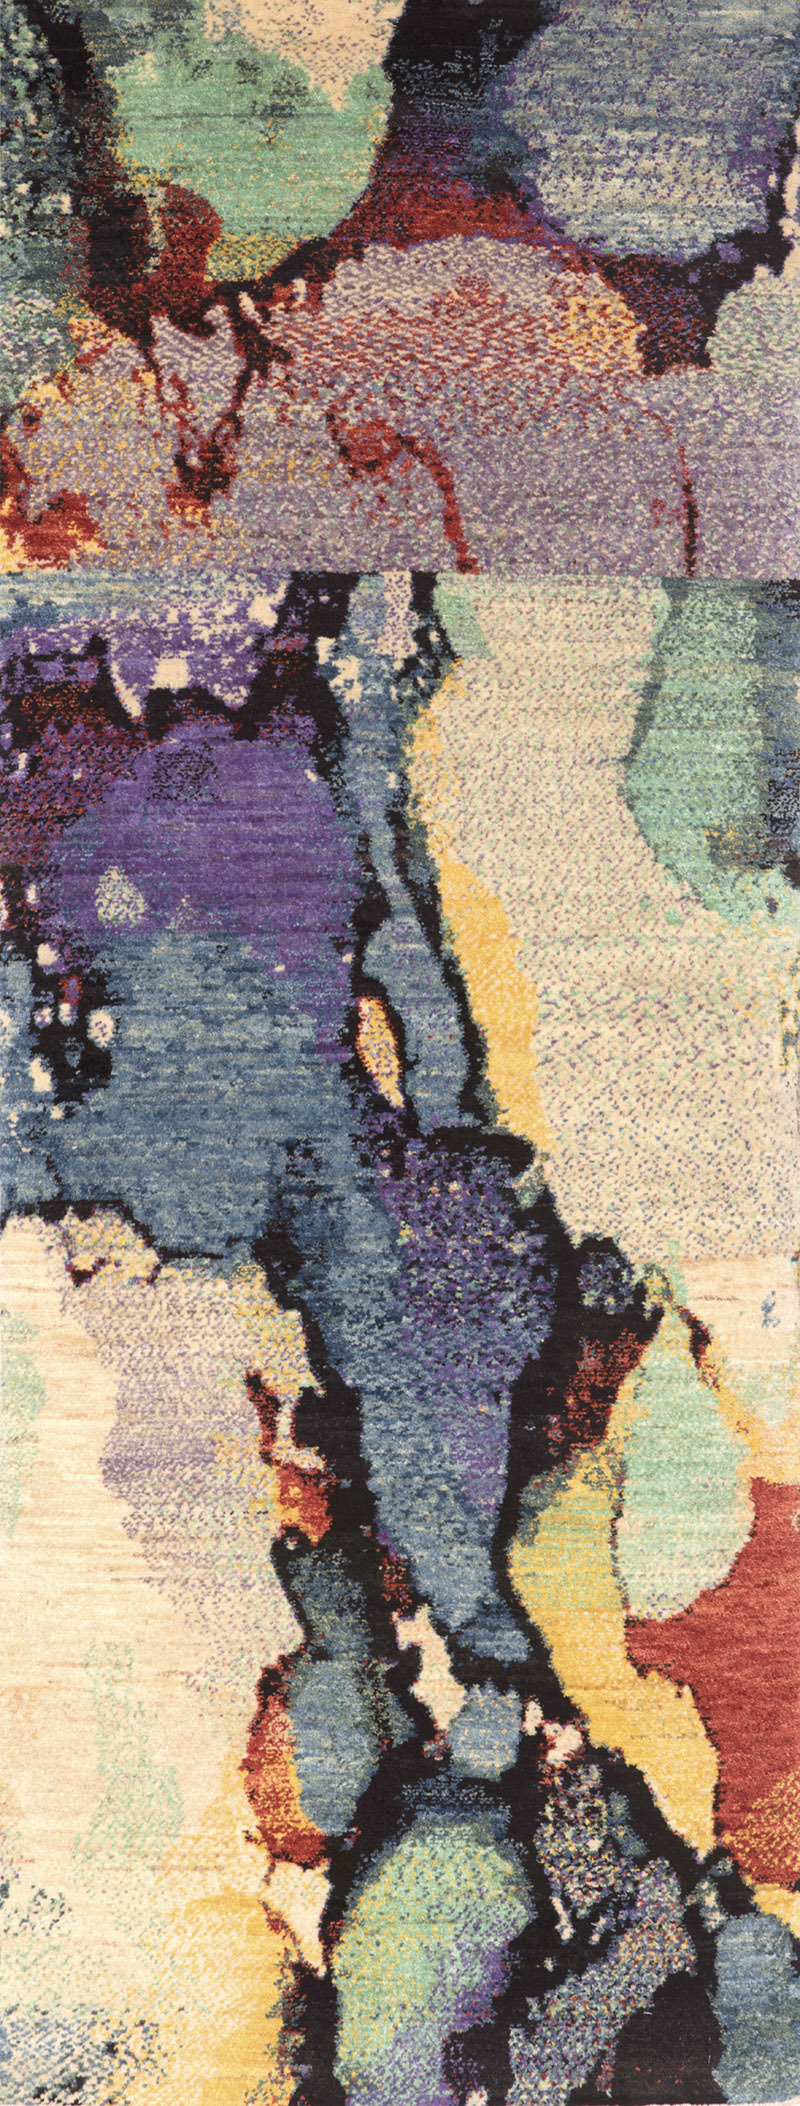 Marmo Pettinato Runner 2W Gabbehs Abstract Plain 83 X 135Cm